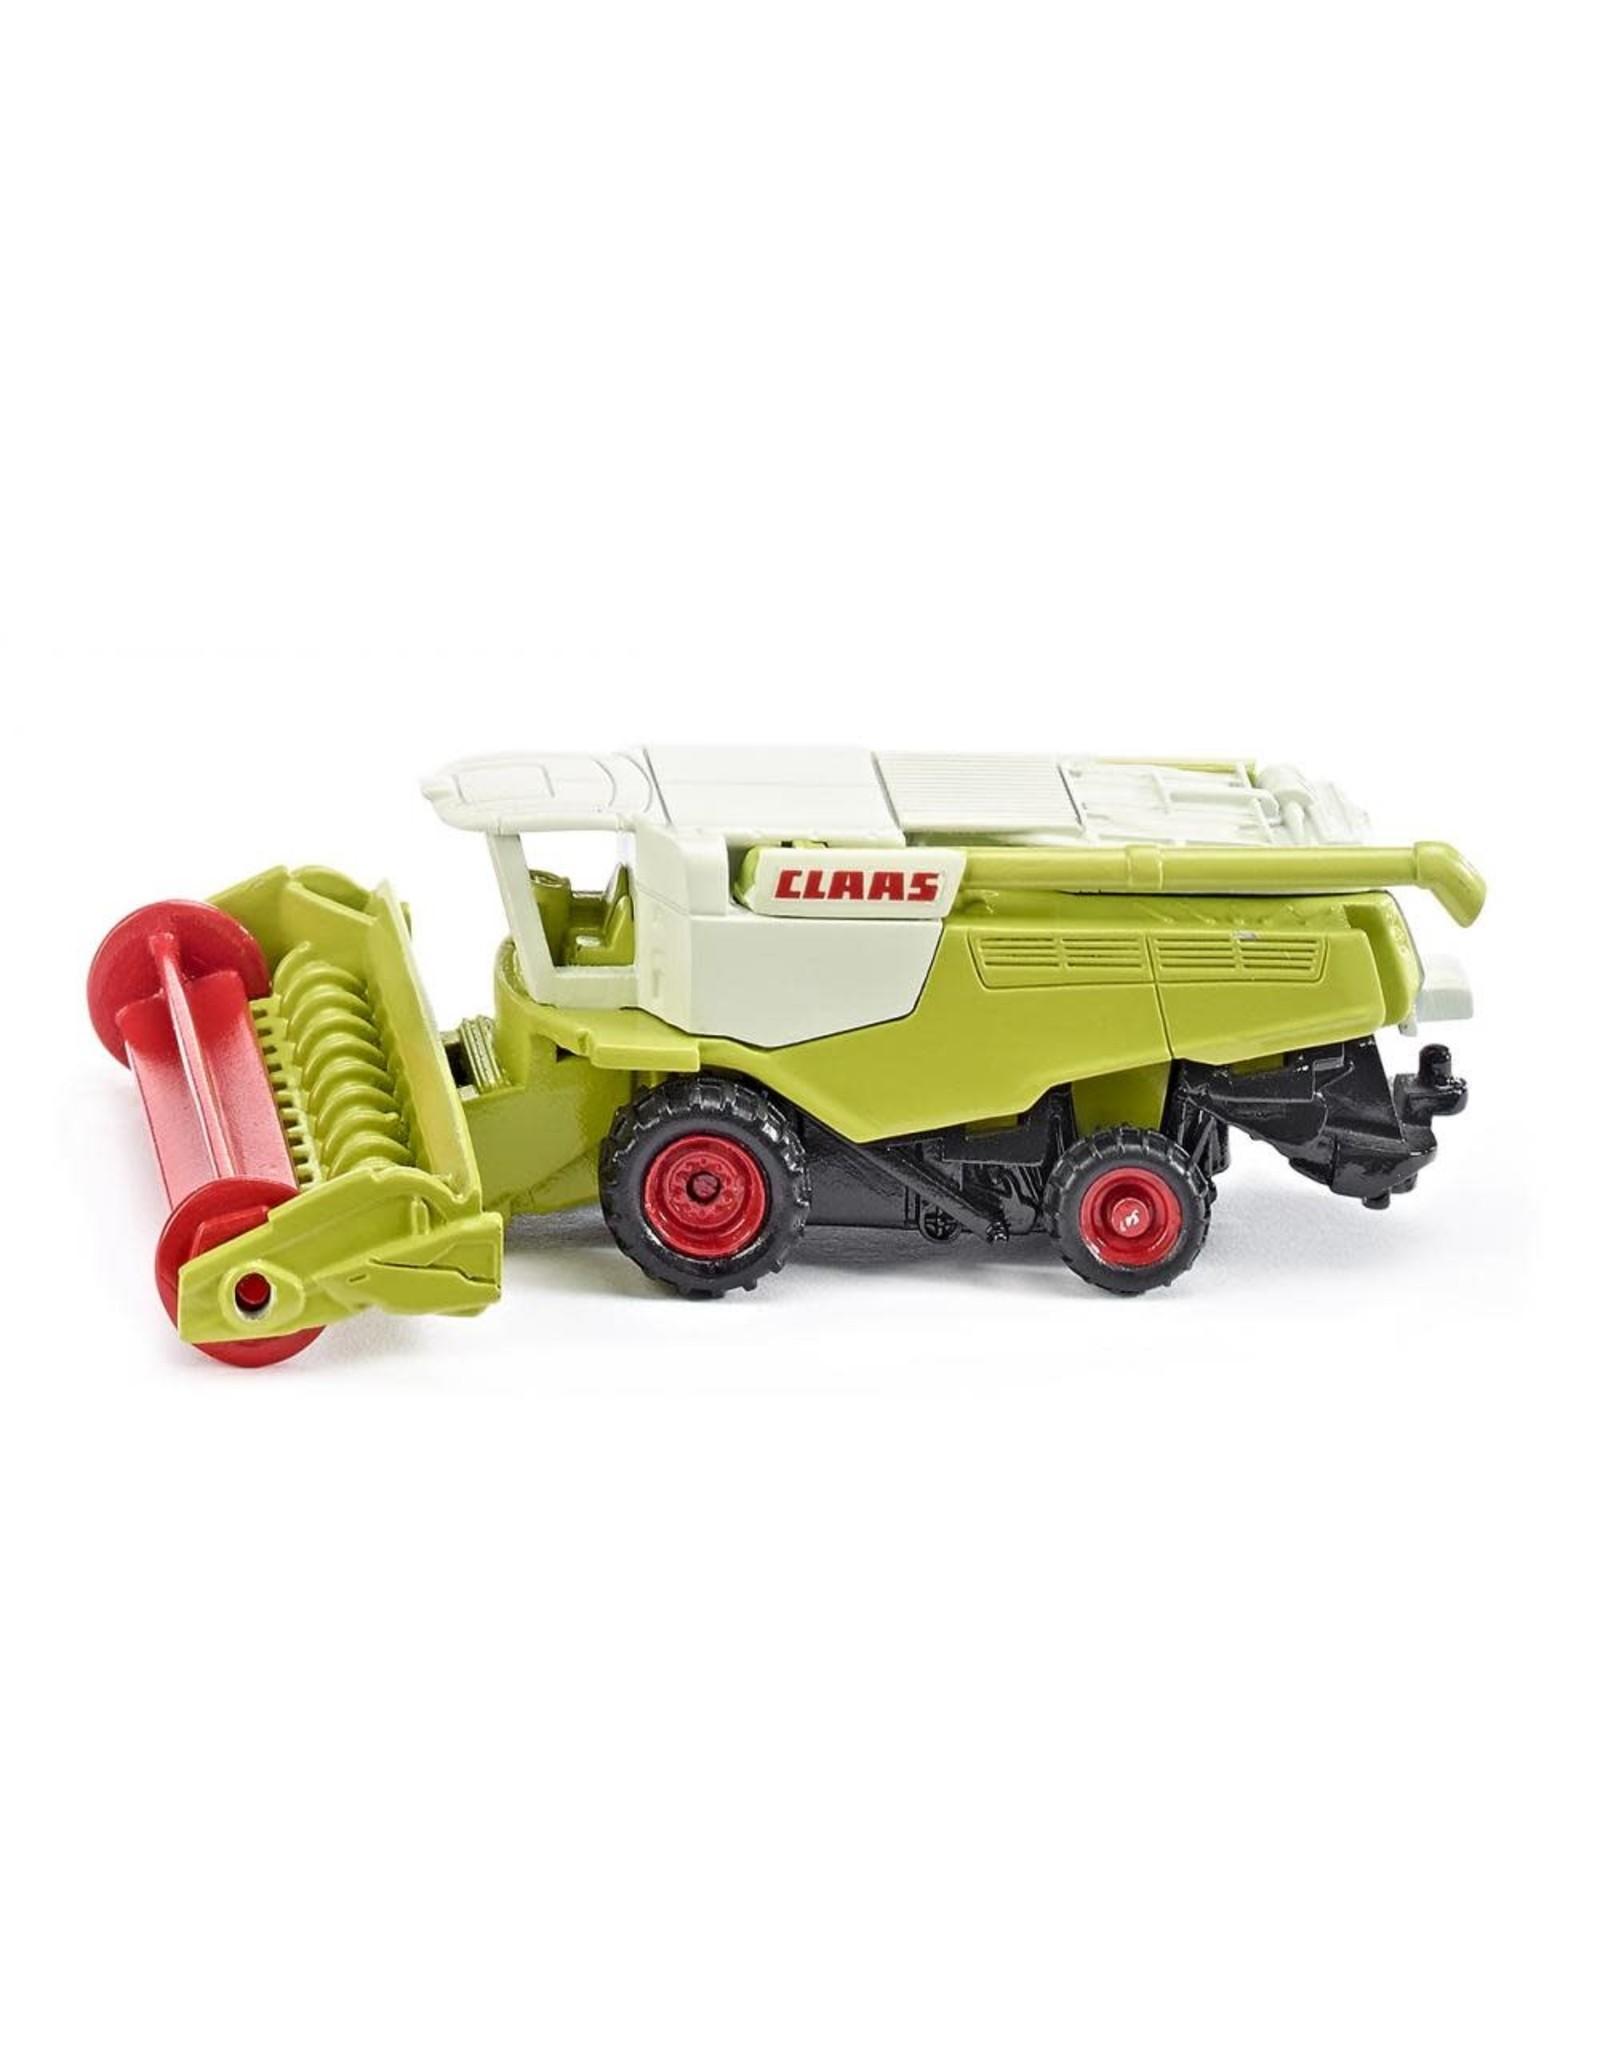 Siku Claas Combine Harvester